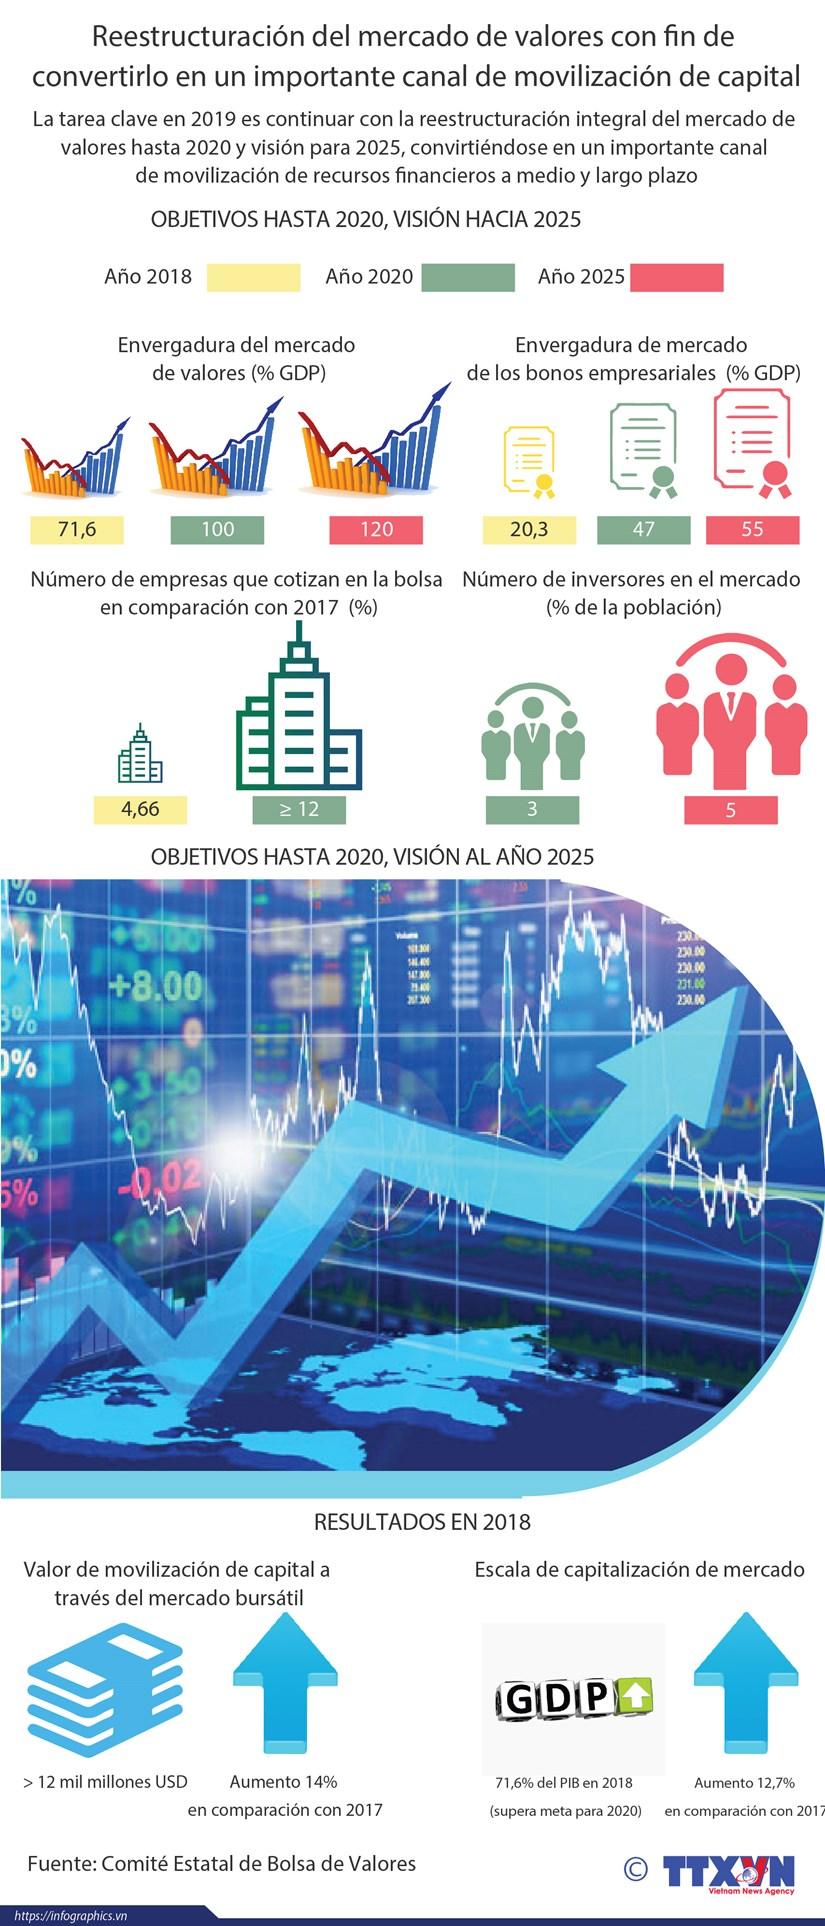 [Info] Reestructuracion del mercado de valores con fin de convertirlo en un importante canal de movilizacion de capital hinh anh 1